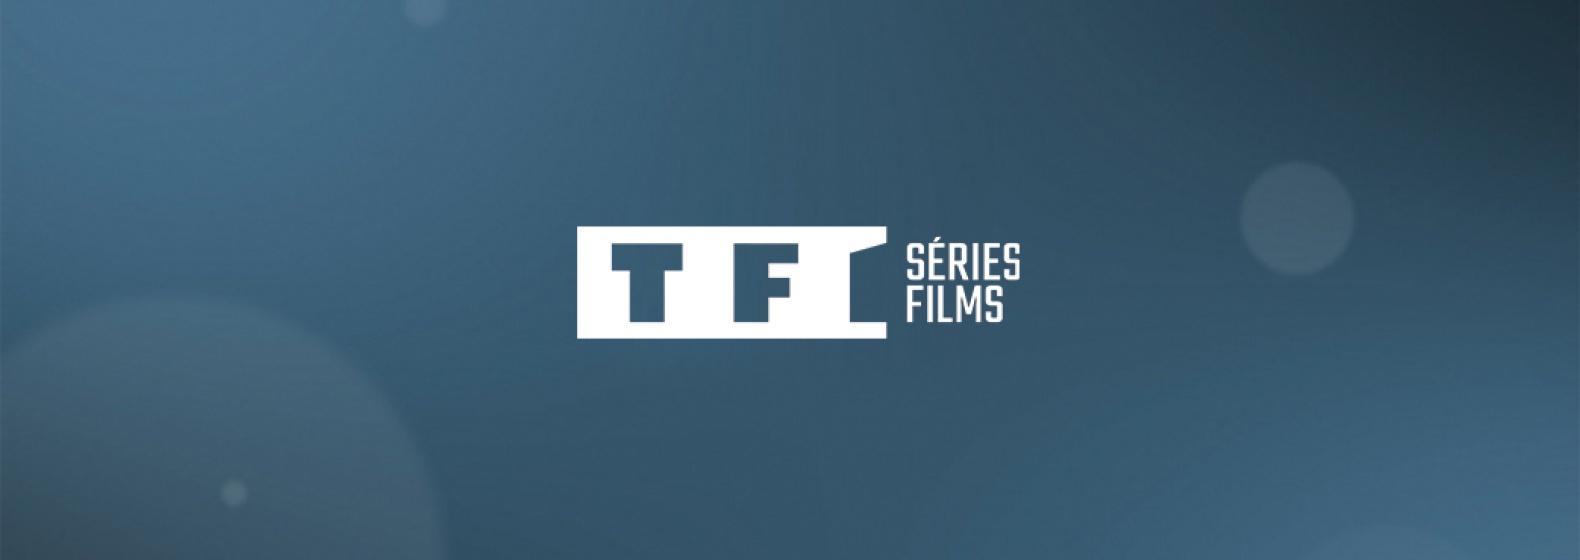 Visuel-image-de-tete-tf1-series-films